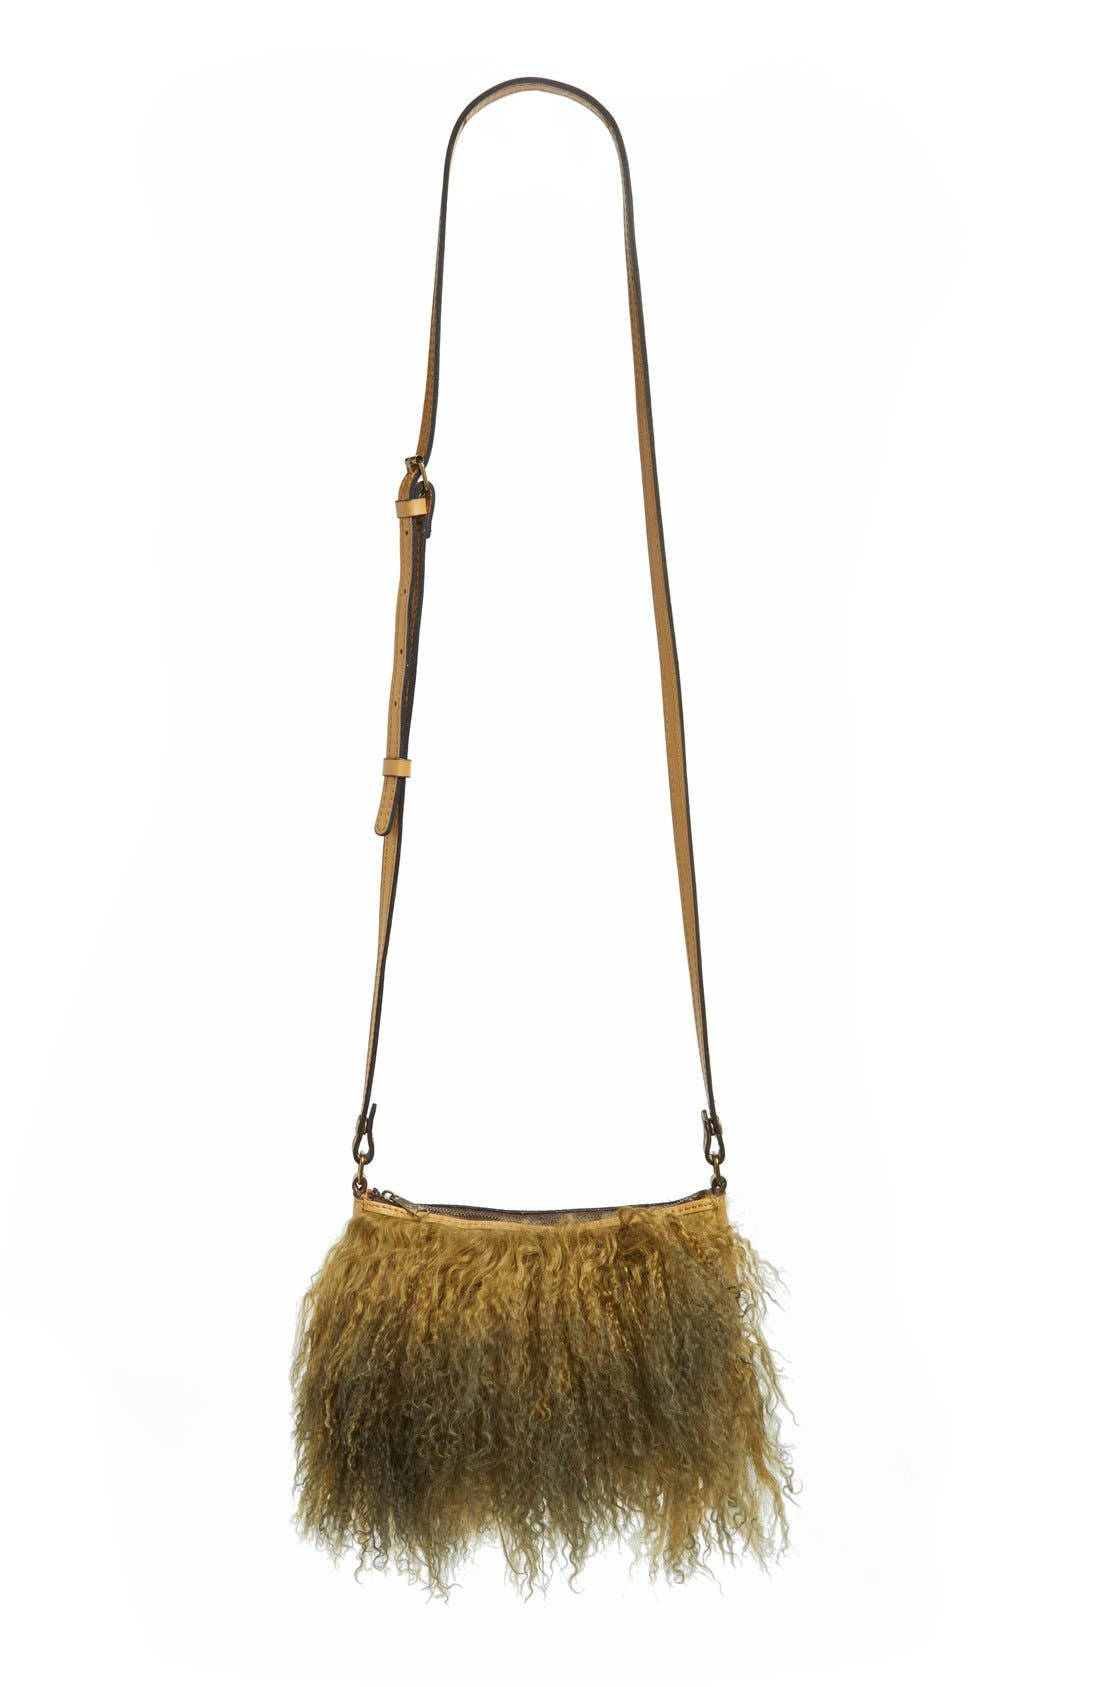 Alternate Image 1 Selected - Patricia Nash Small Paulo Genuine Shearling Crossbody Bag